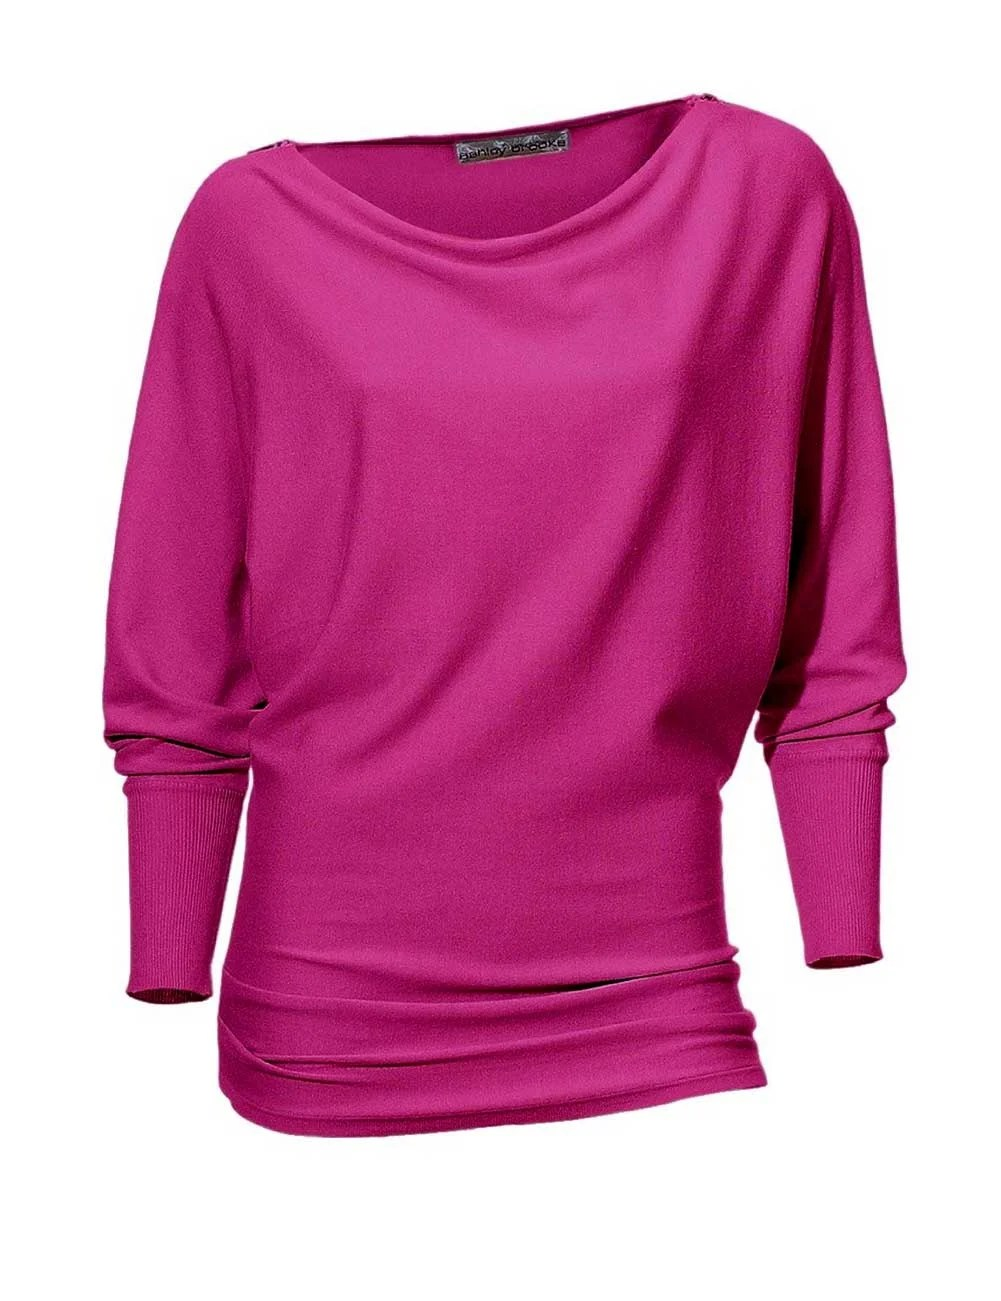 007.844 ASHLEY BROOKE Damen Designer-Reißverschlußpullover Pink Fledermausärmel